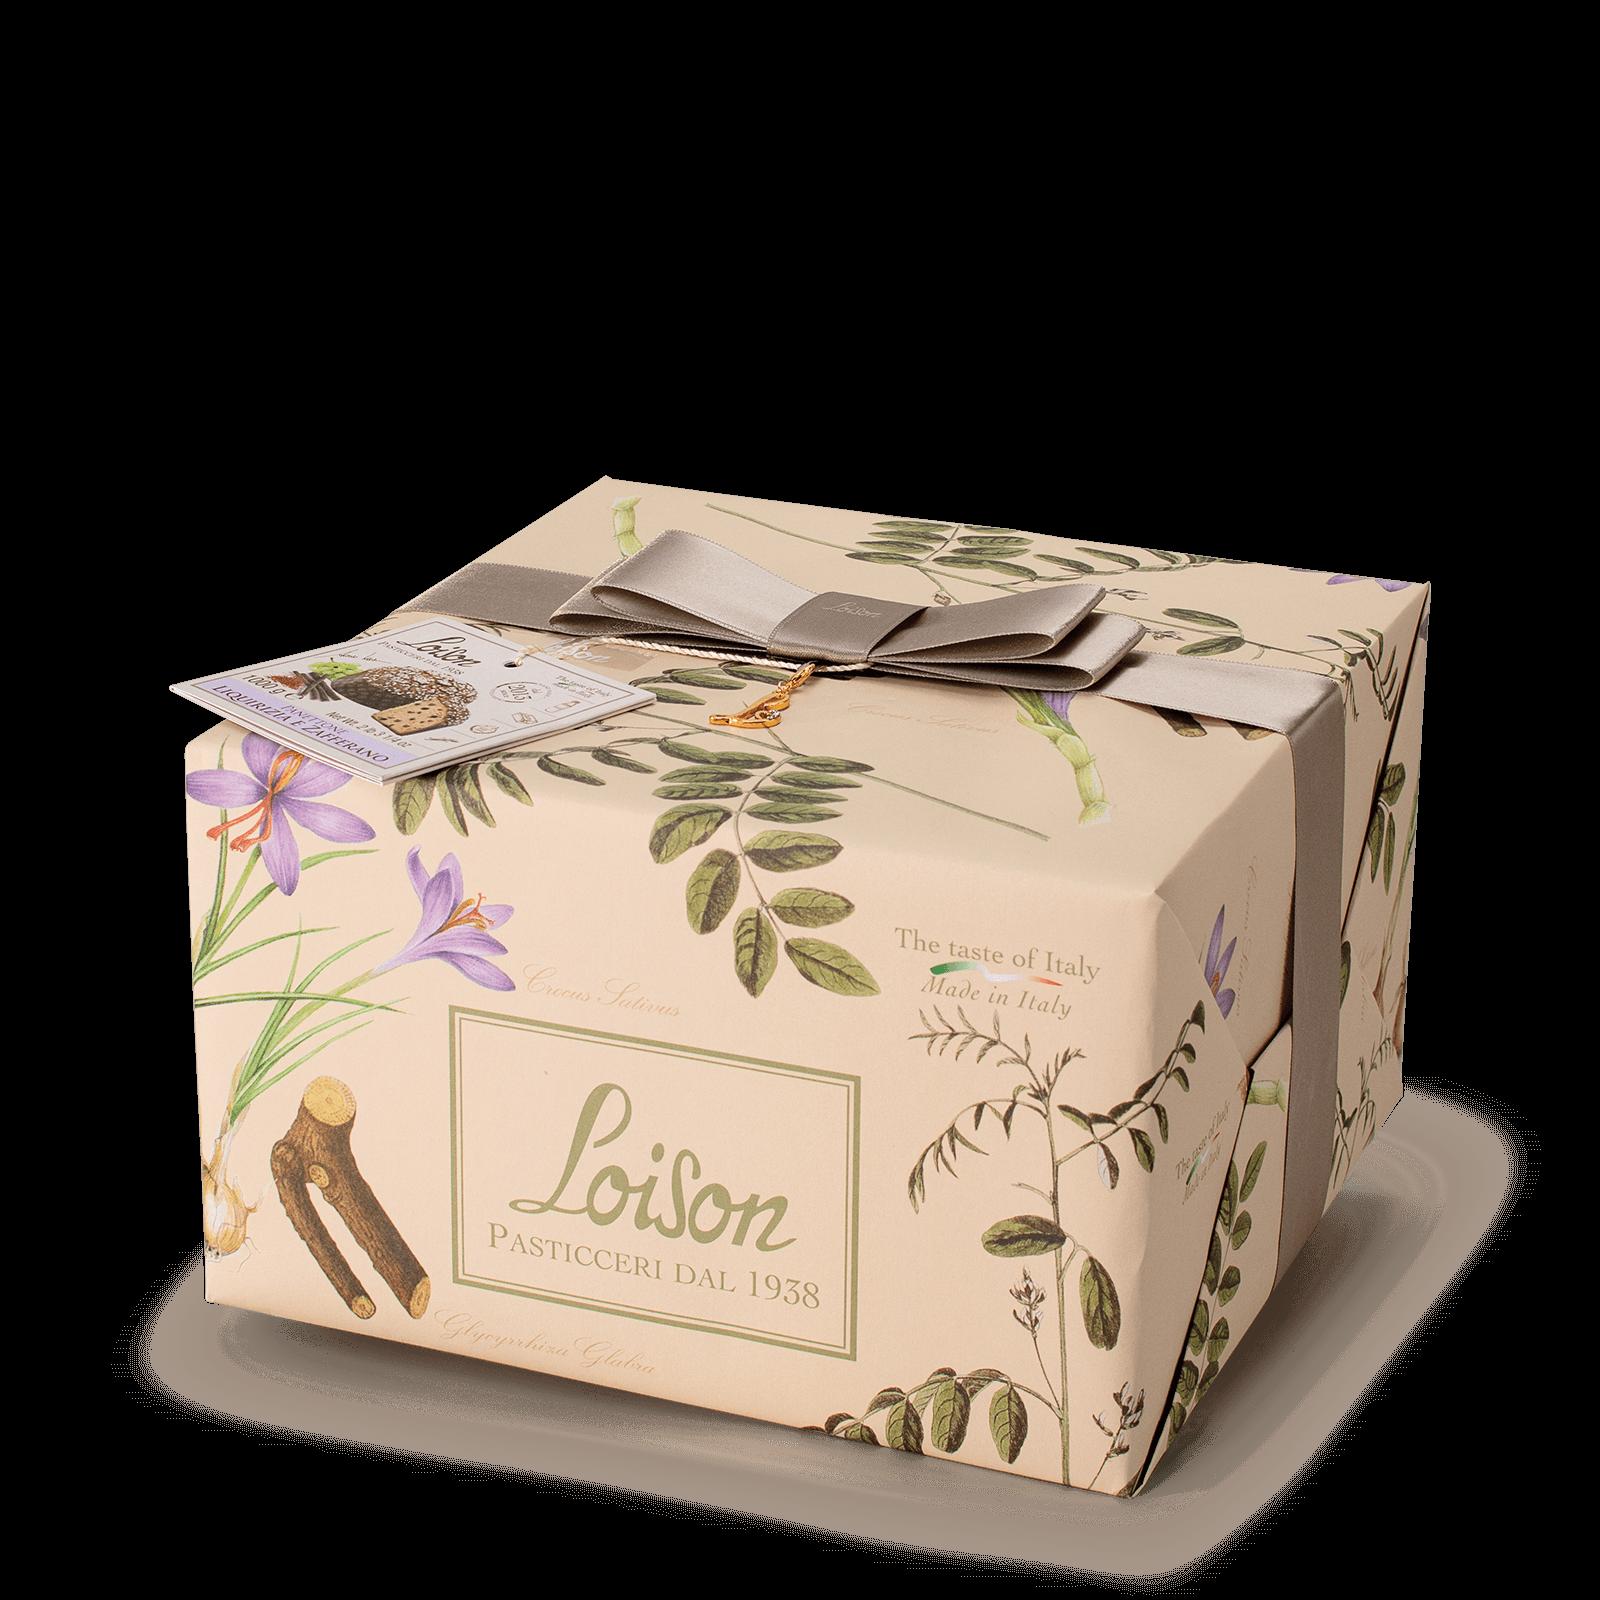 Liquorice and saffron Panettone - Fruit and Flowers Loison